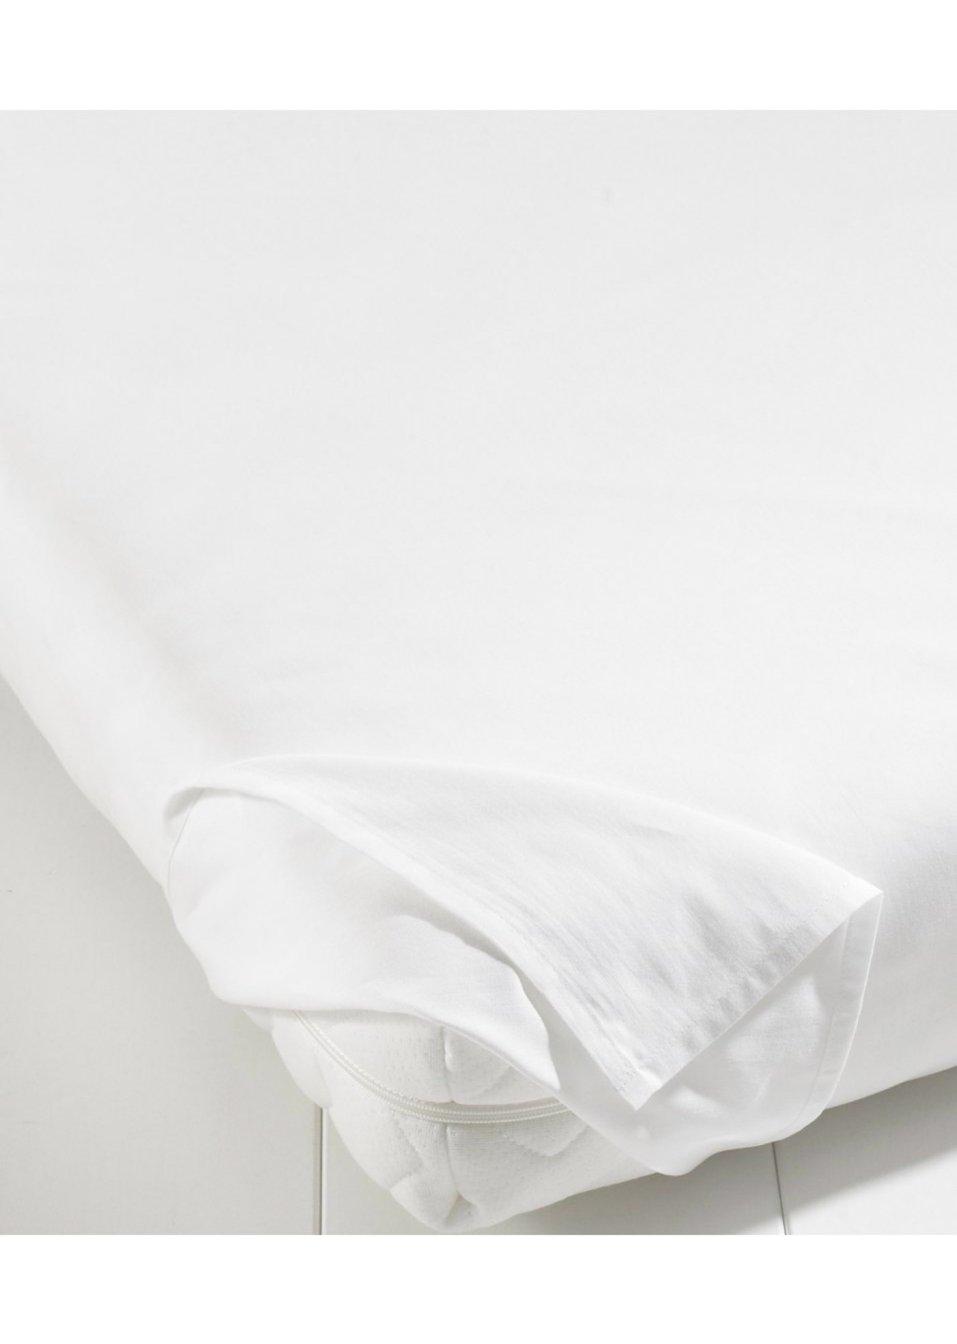 bettlaken linon wei wohnen bpc living. Black Bedroom Furniture Sets. Home Design Ideas